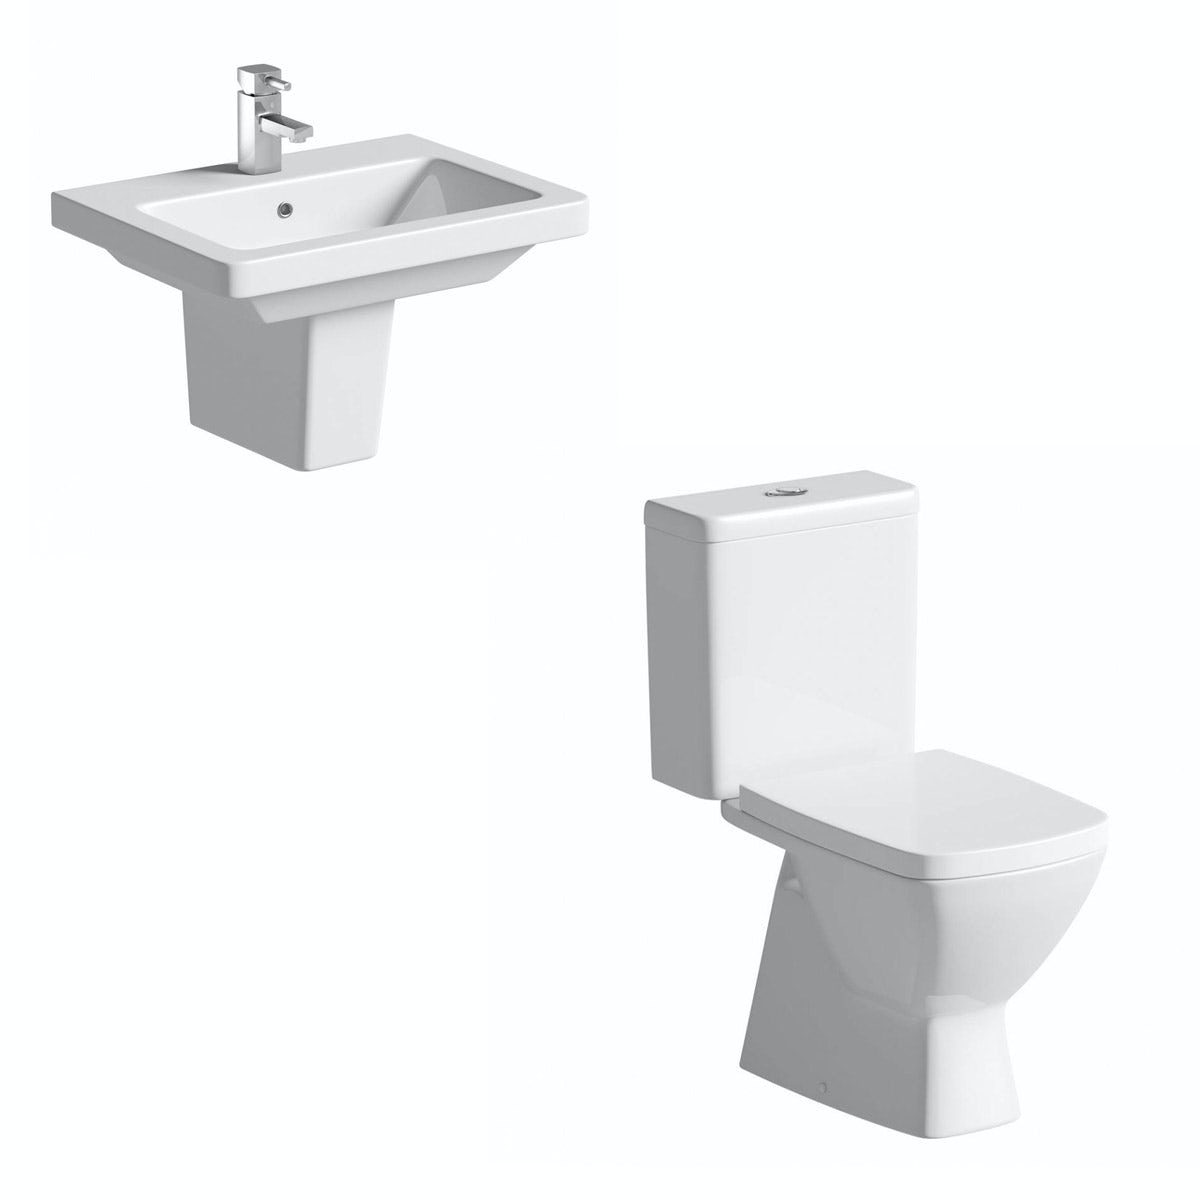 Mode Cooper cloakroom suite with semi pedestal basin 550mm